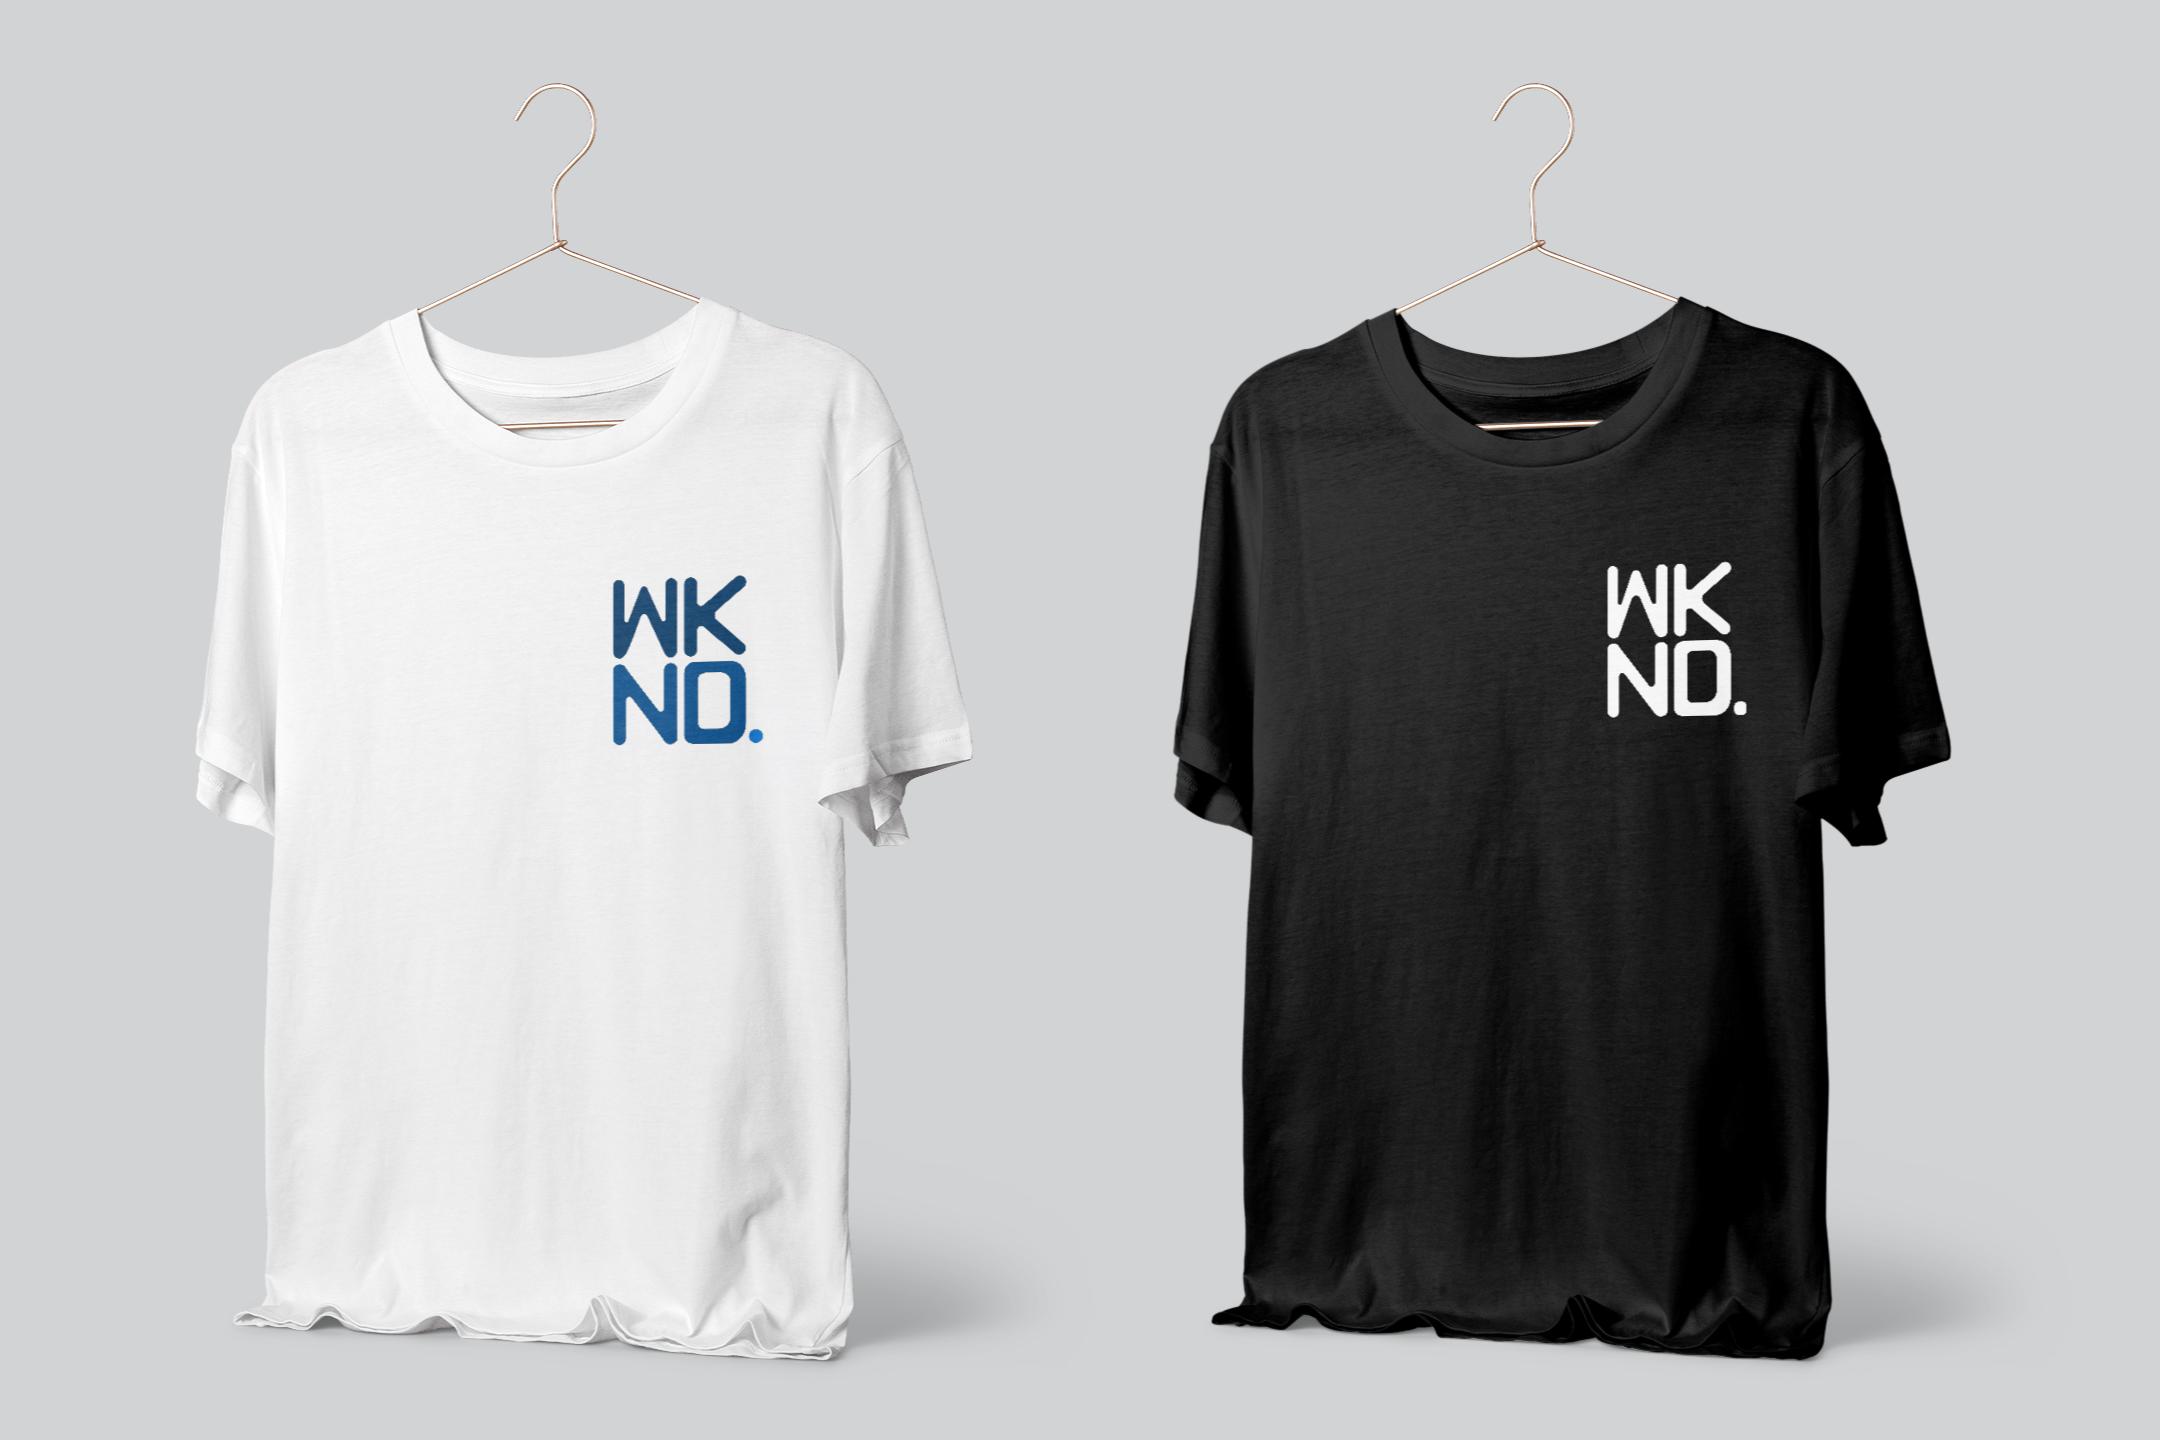 wknd tshirt logo mockup